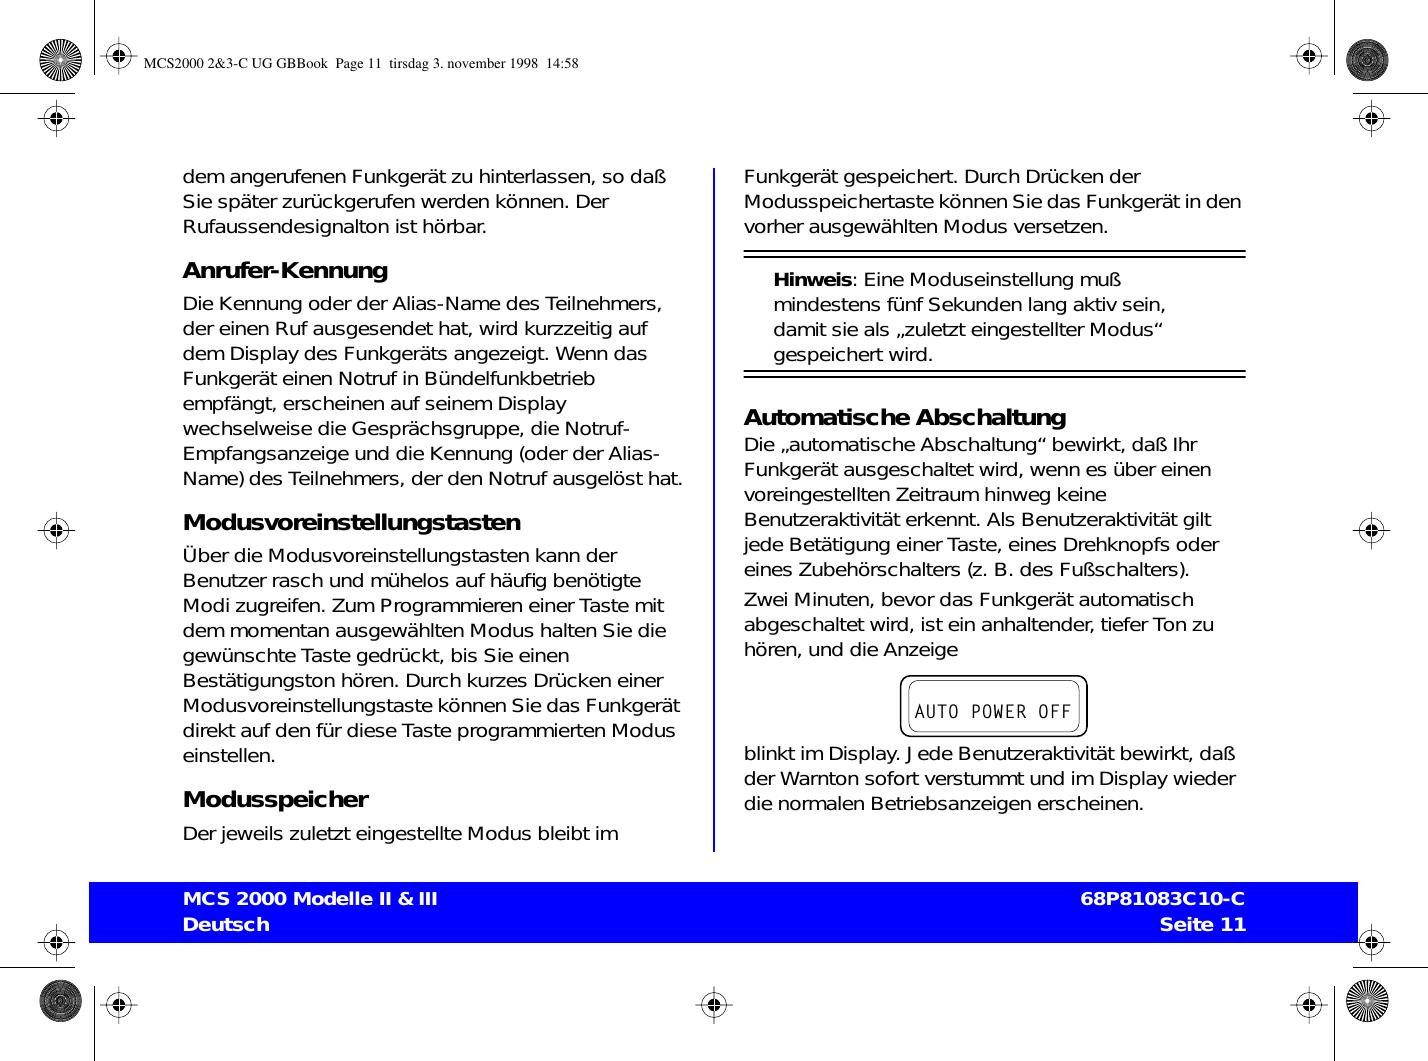 Motorola 68p81083c10 C Users Manual Mcs2000 23 Ug Gbbook